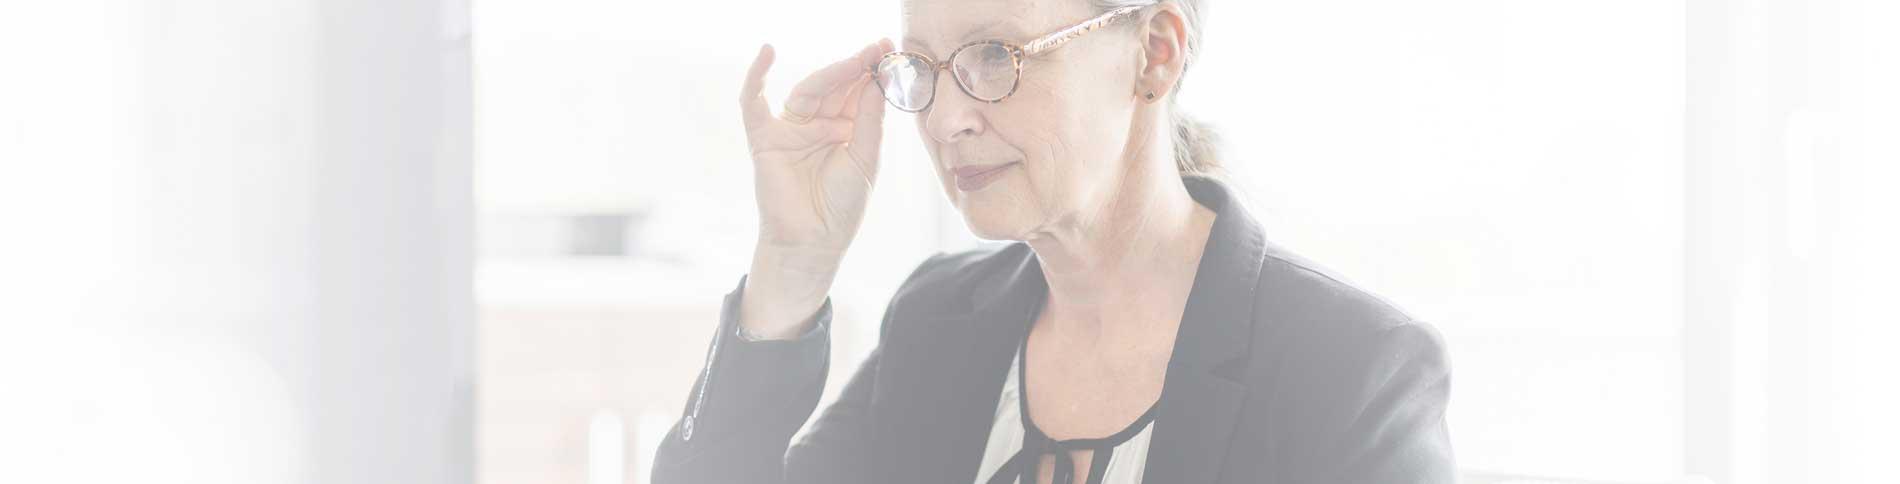 woman adjusting her glasses